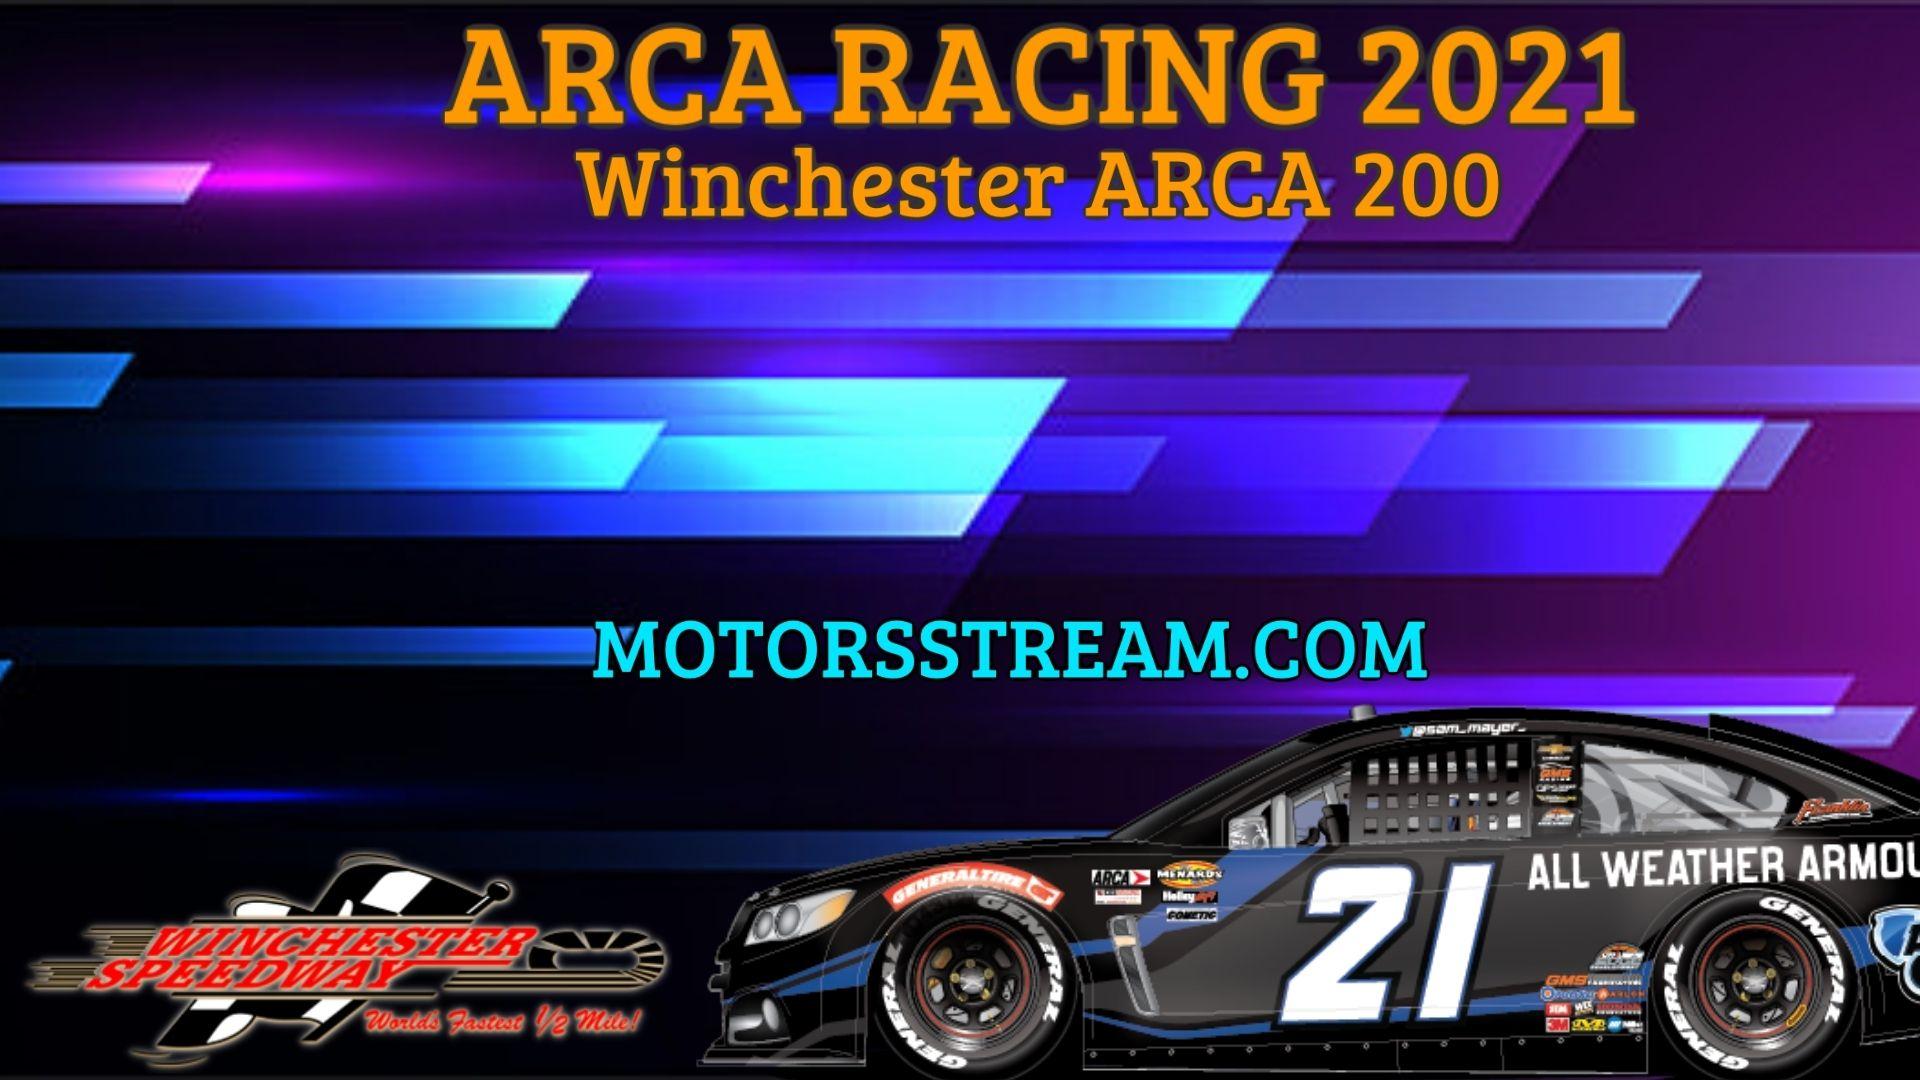 Winchester ARCA 200 Live Stream 2021 Arca Racing